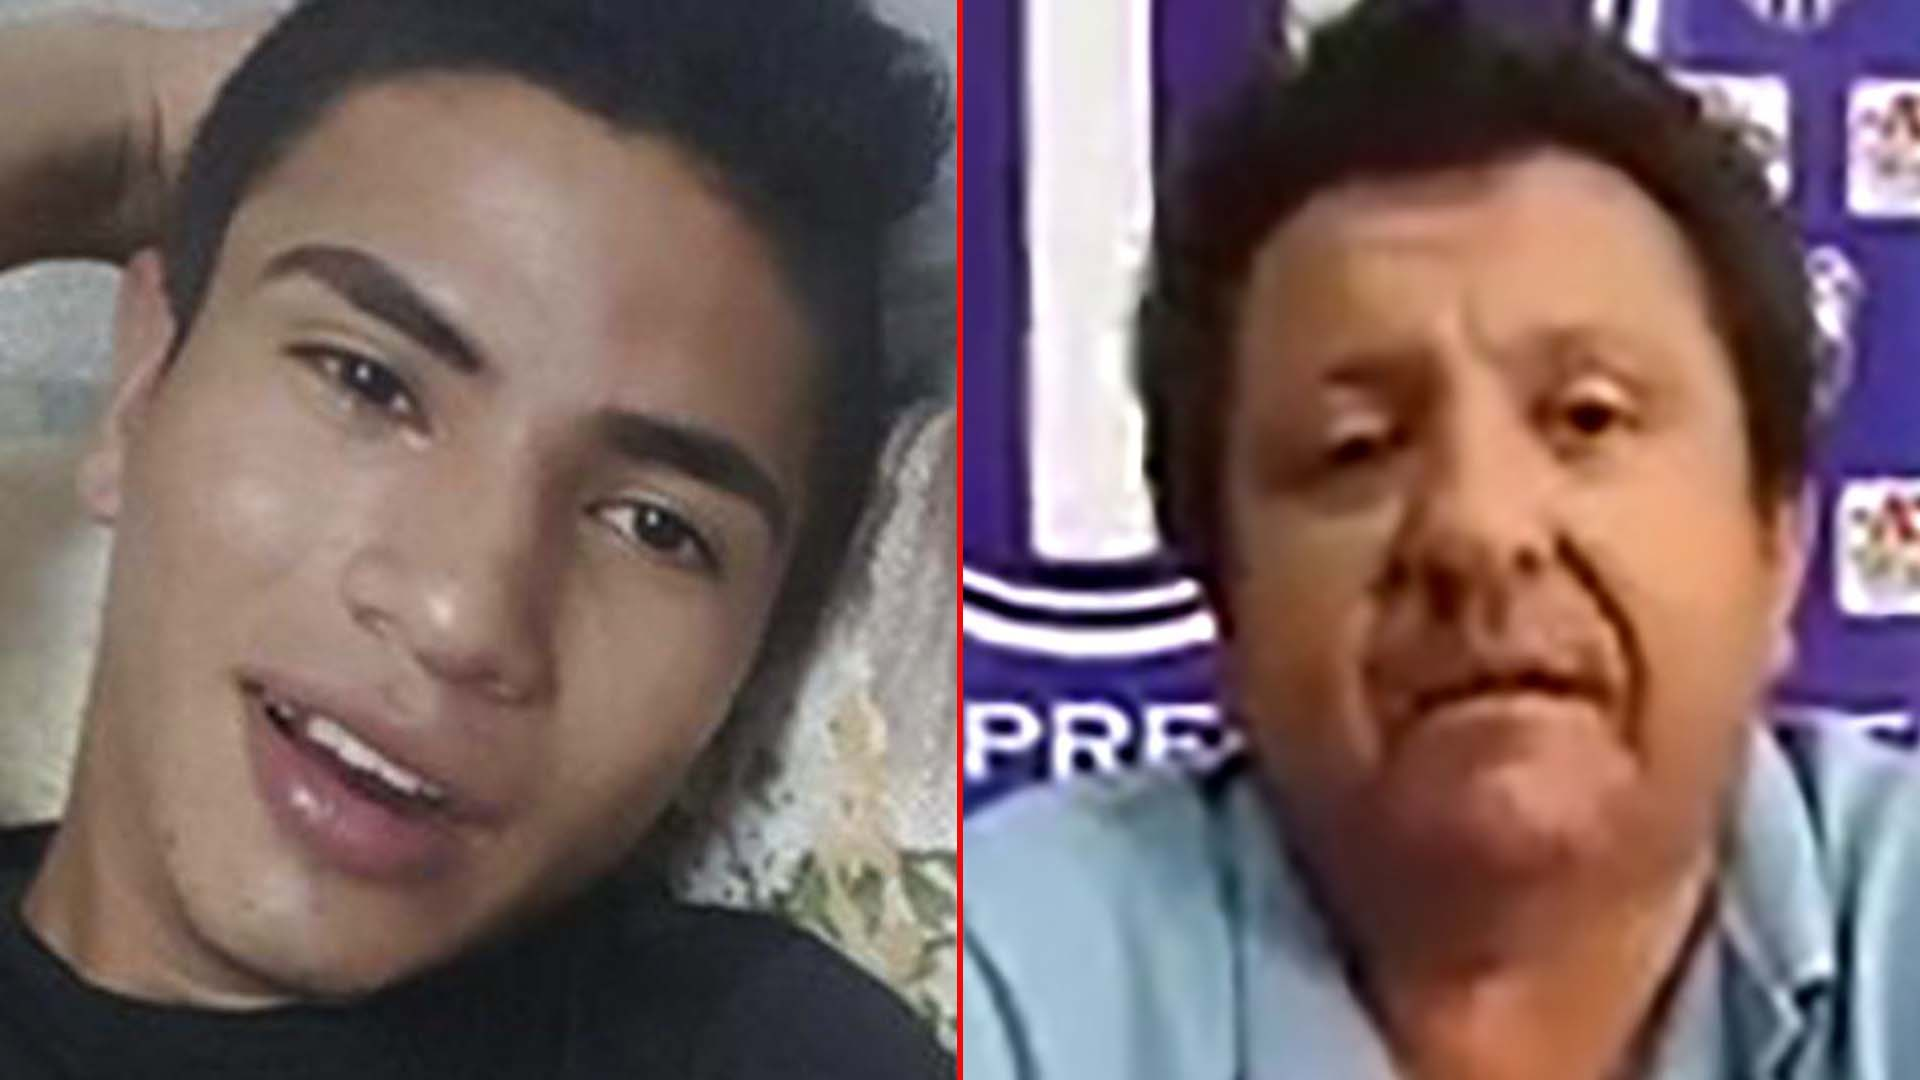 Fermín Morinigo denunció acoso y amenazas por parte de González